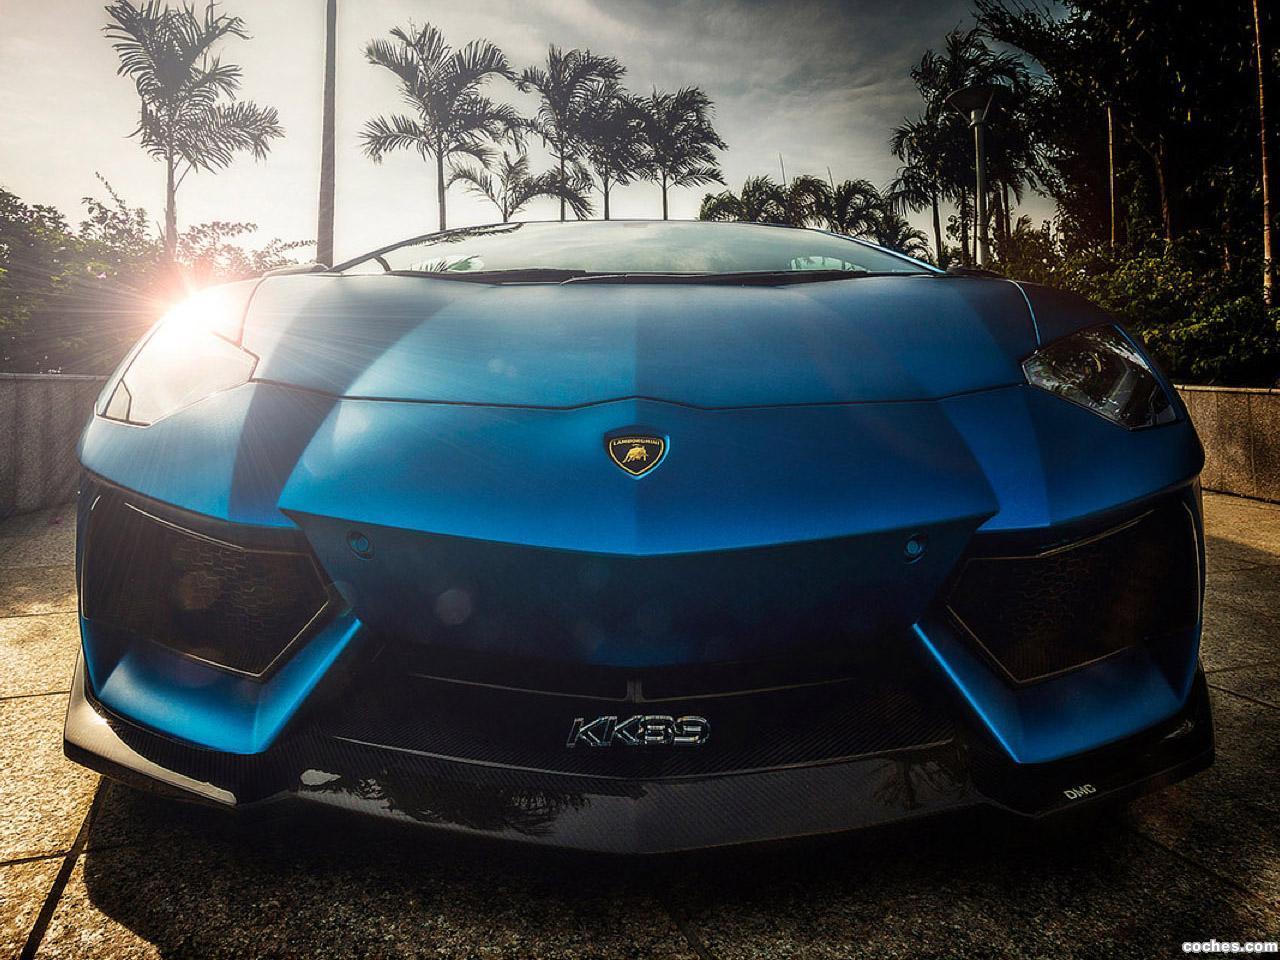 Foto 0 de DMC Design Lamborghini Aventador LP700 Molto Veloce by Jordan Chong 2013